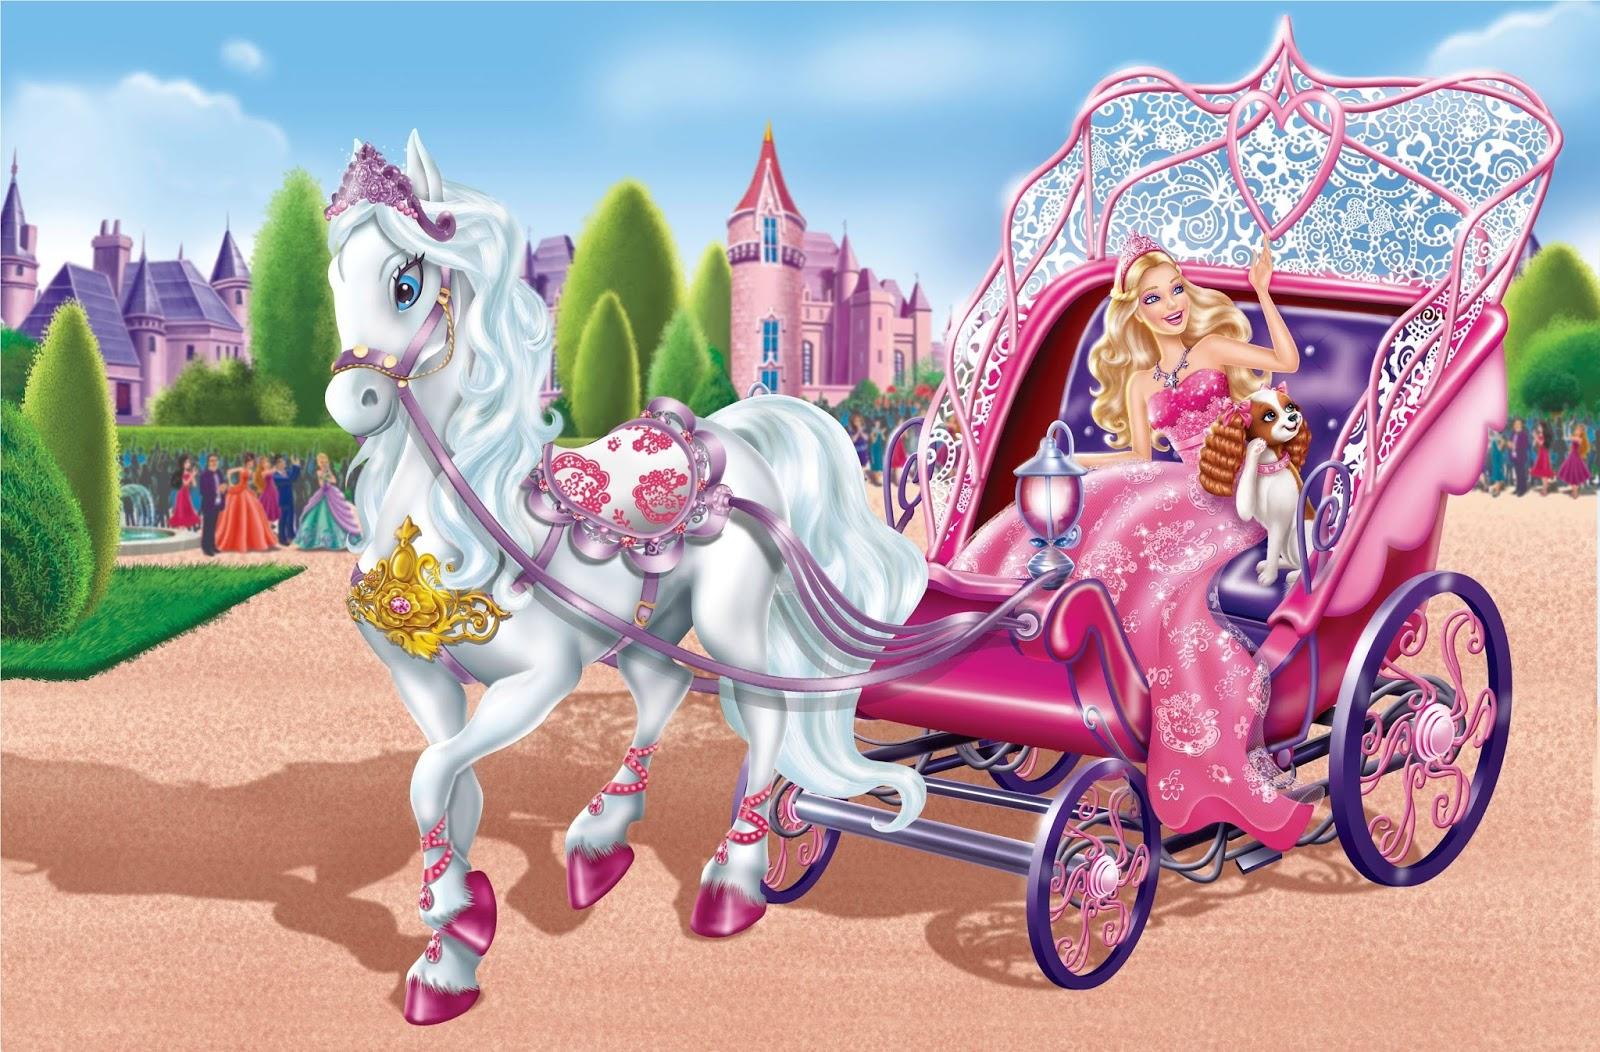 Popular Wallpaper Butterfly Barbie - barbie-princess-wallpaper-hd  Snapshot_152780.jpg